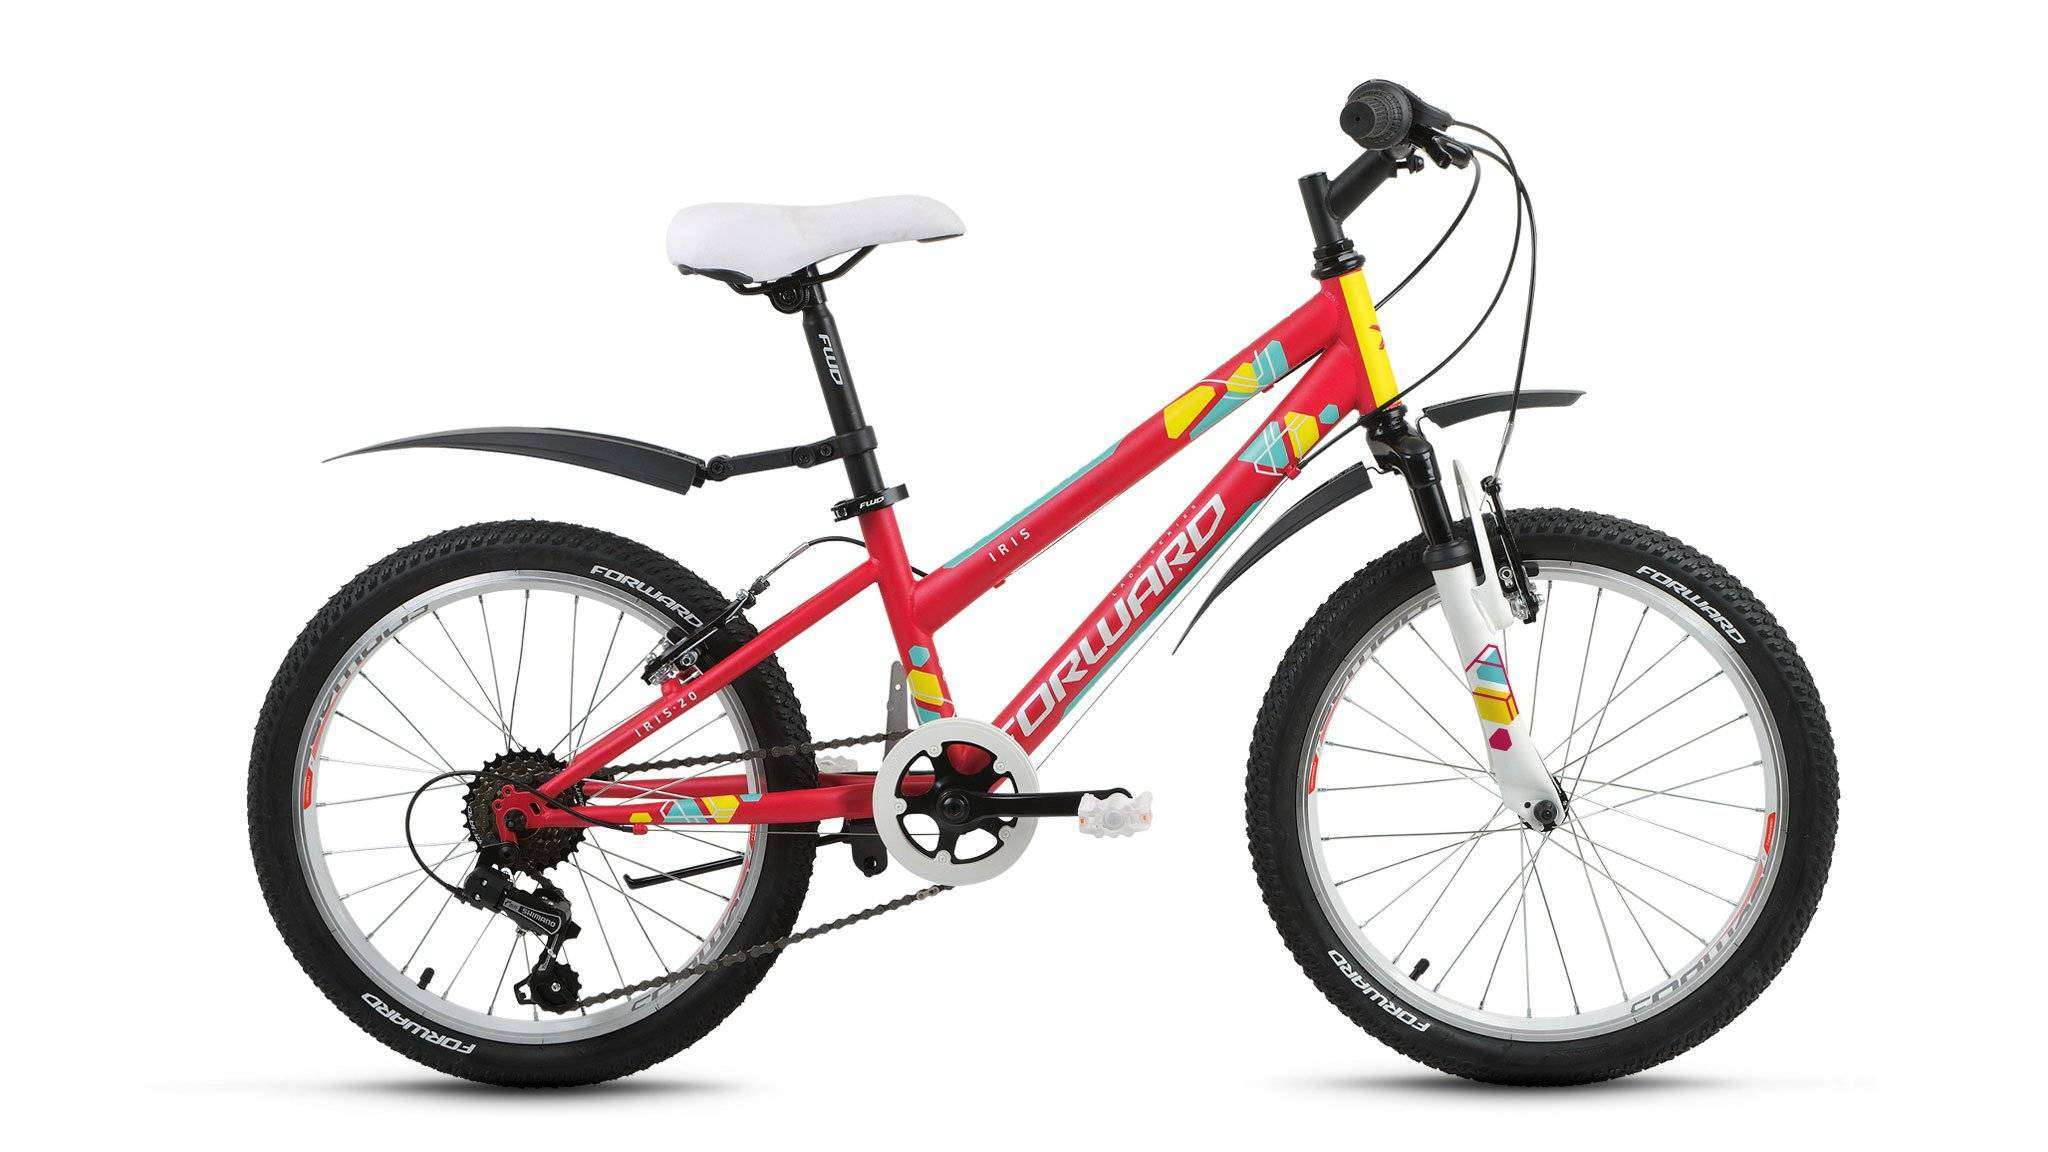 Велосипед FORWARD IRIS 20 2017-2018 37664